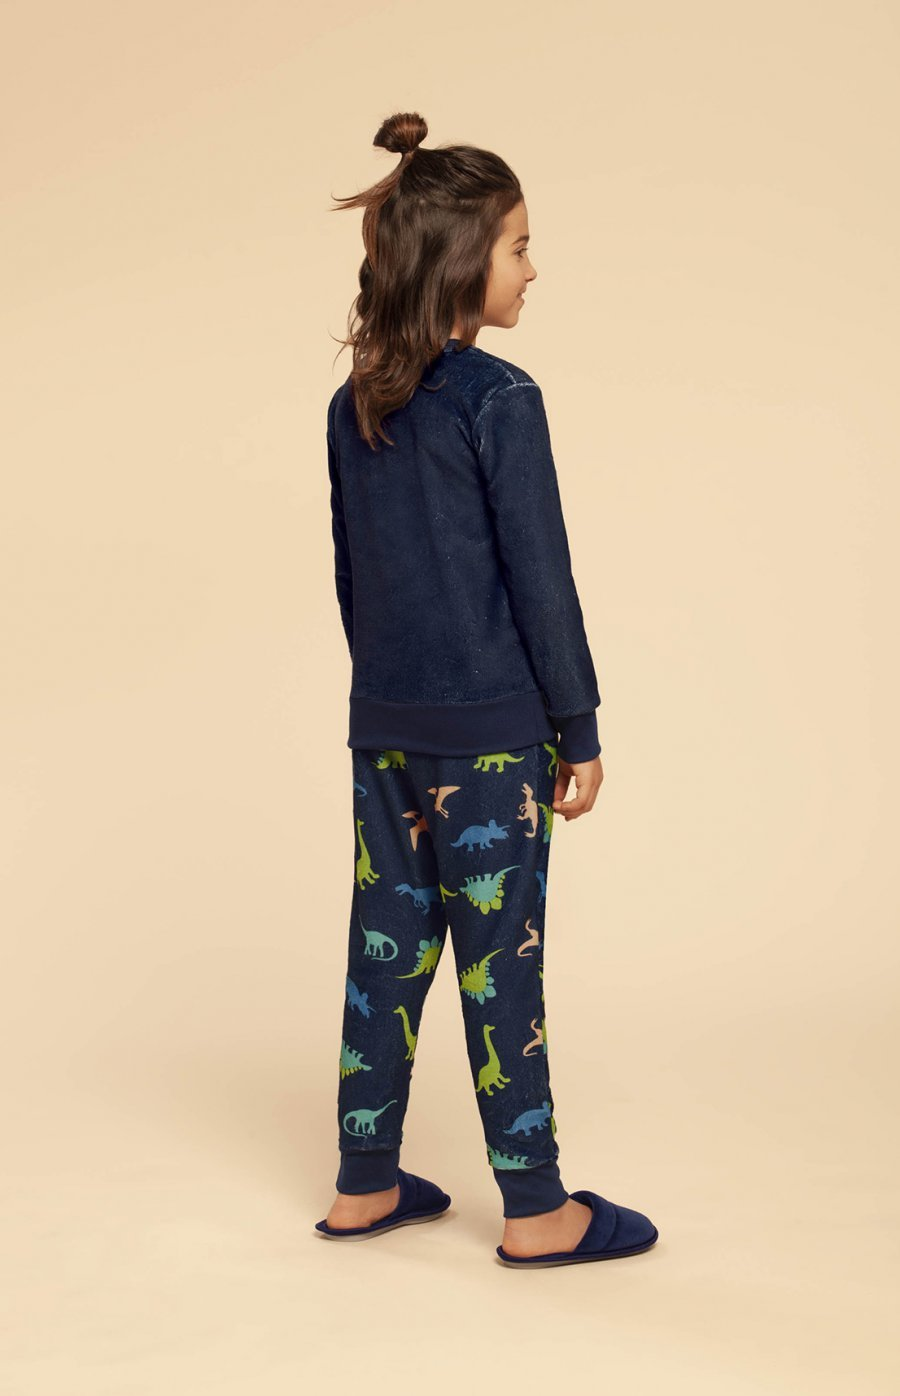 Pijama Infantil Soft Dino Inverno 2019 PROMO